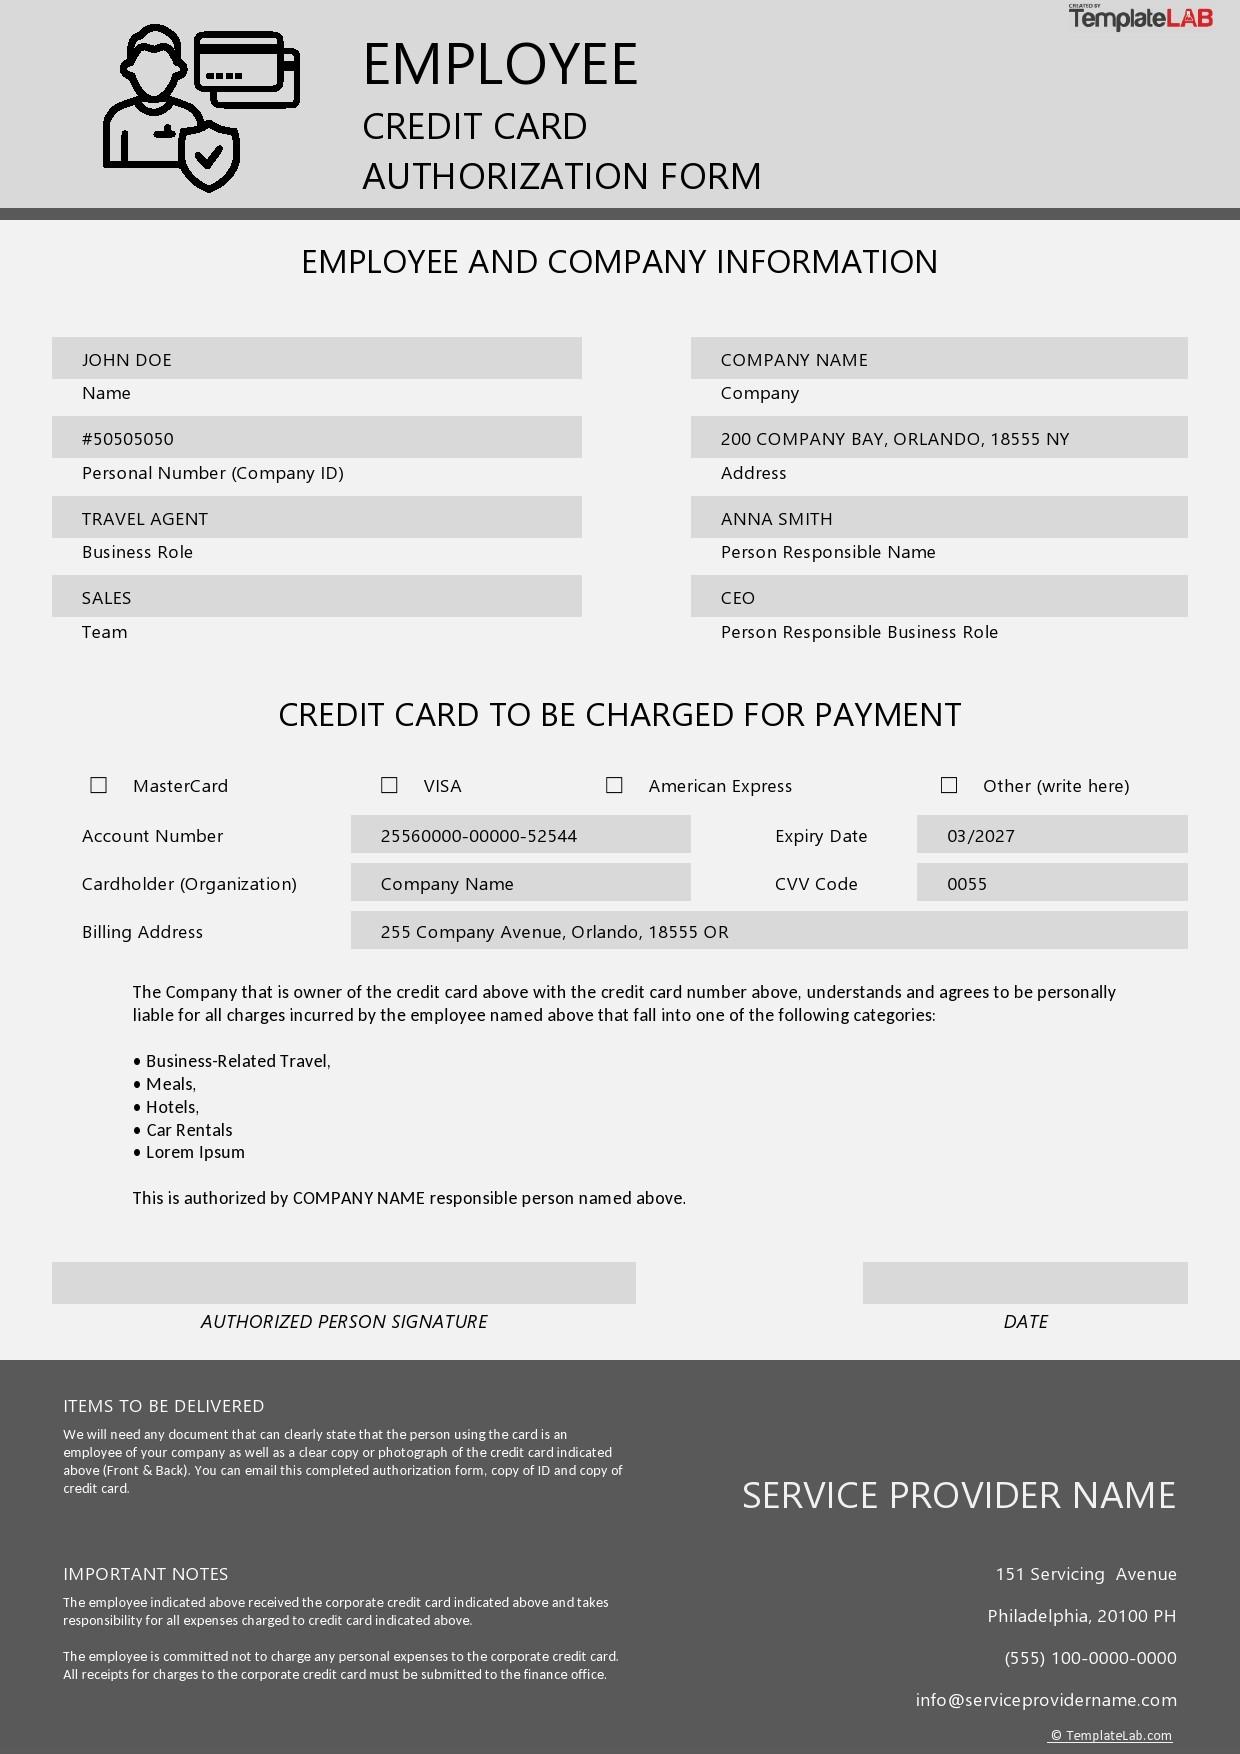 Free Employee Credit Card Authorization Form - TemplateLab.com